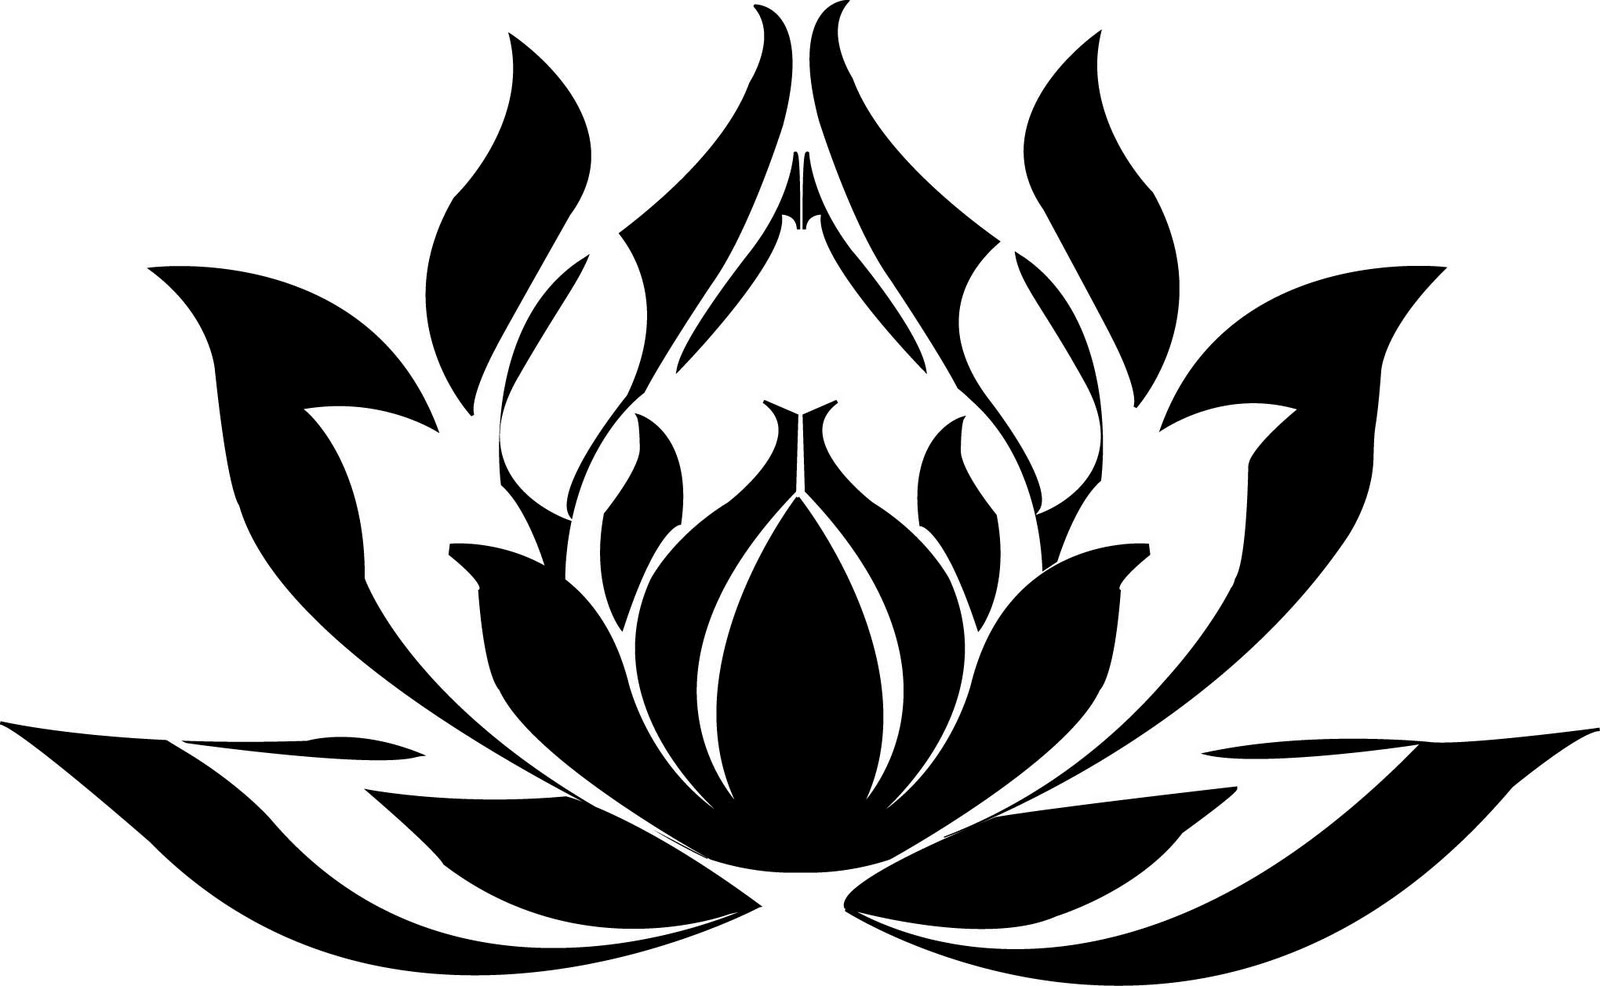 Image zalian symbolg stargate renaissance wiki fandom zalian symbolg izmirmasajfo